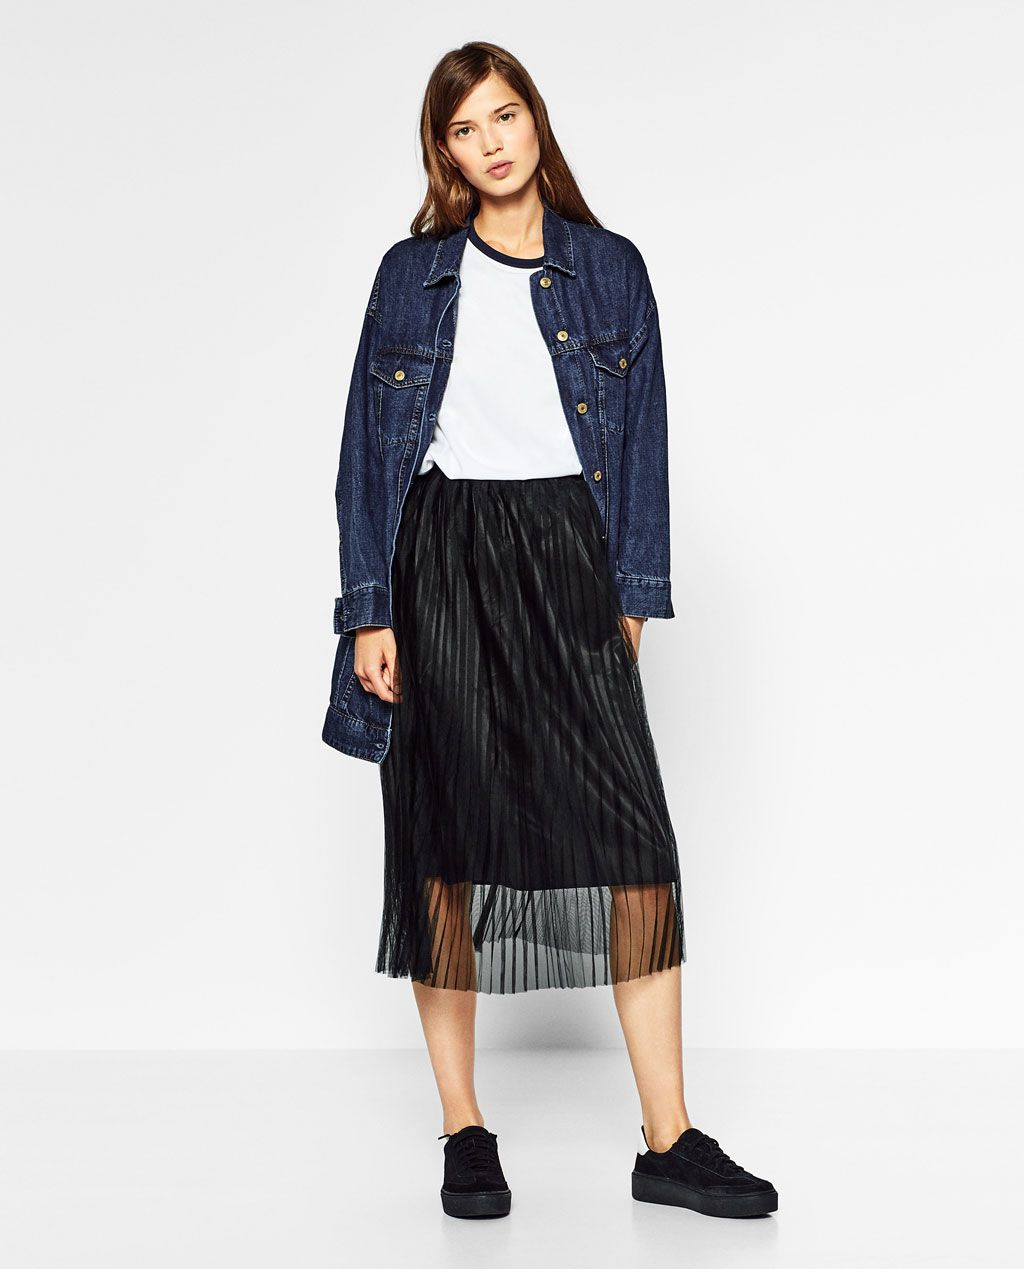 48794e533 Imagen 1 de FALDA TUL PLISADA de Zara | My Style | Faldas de tul ...